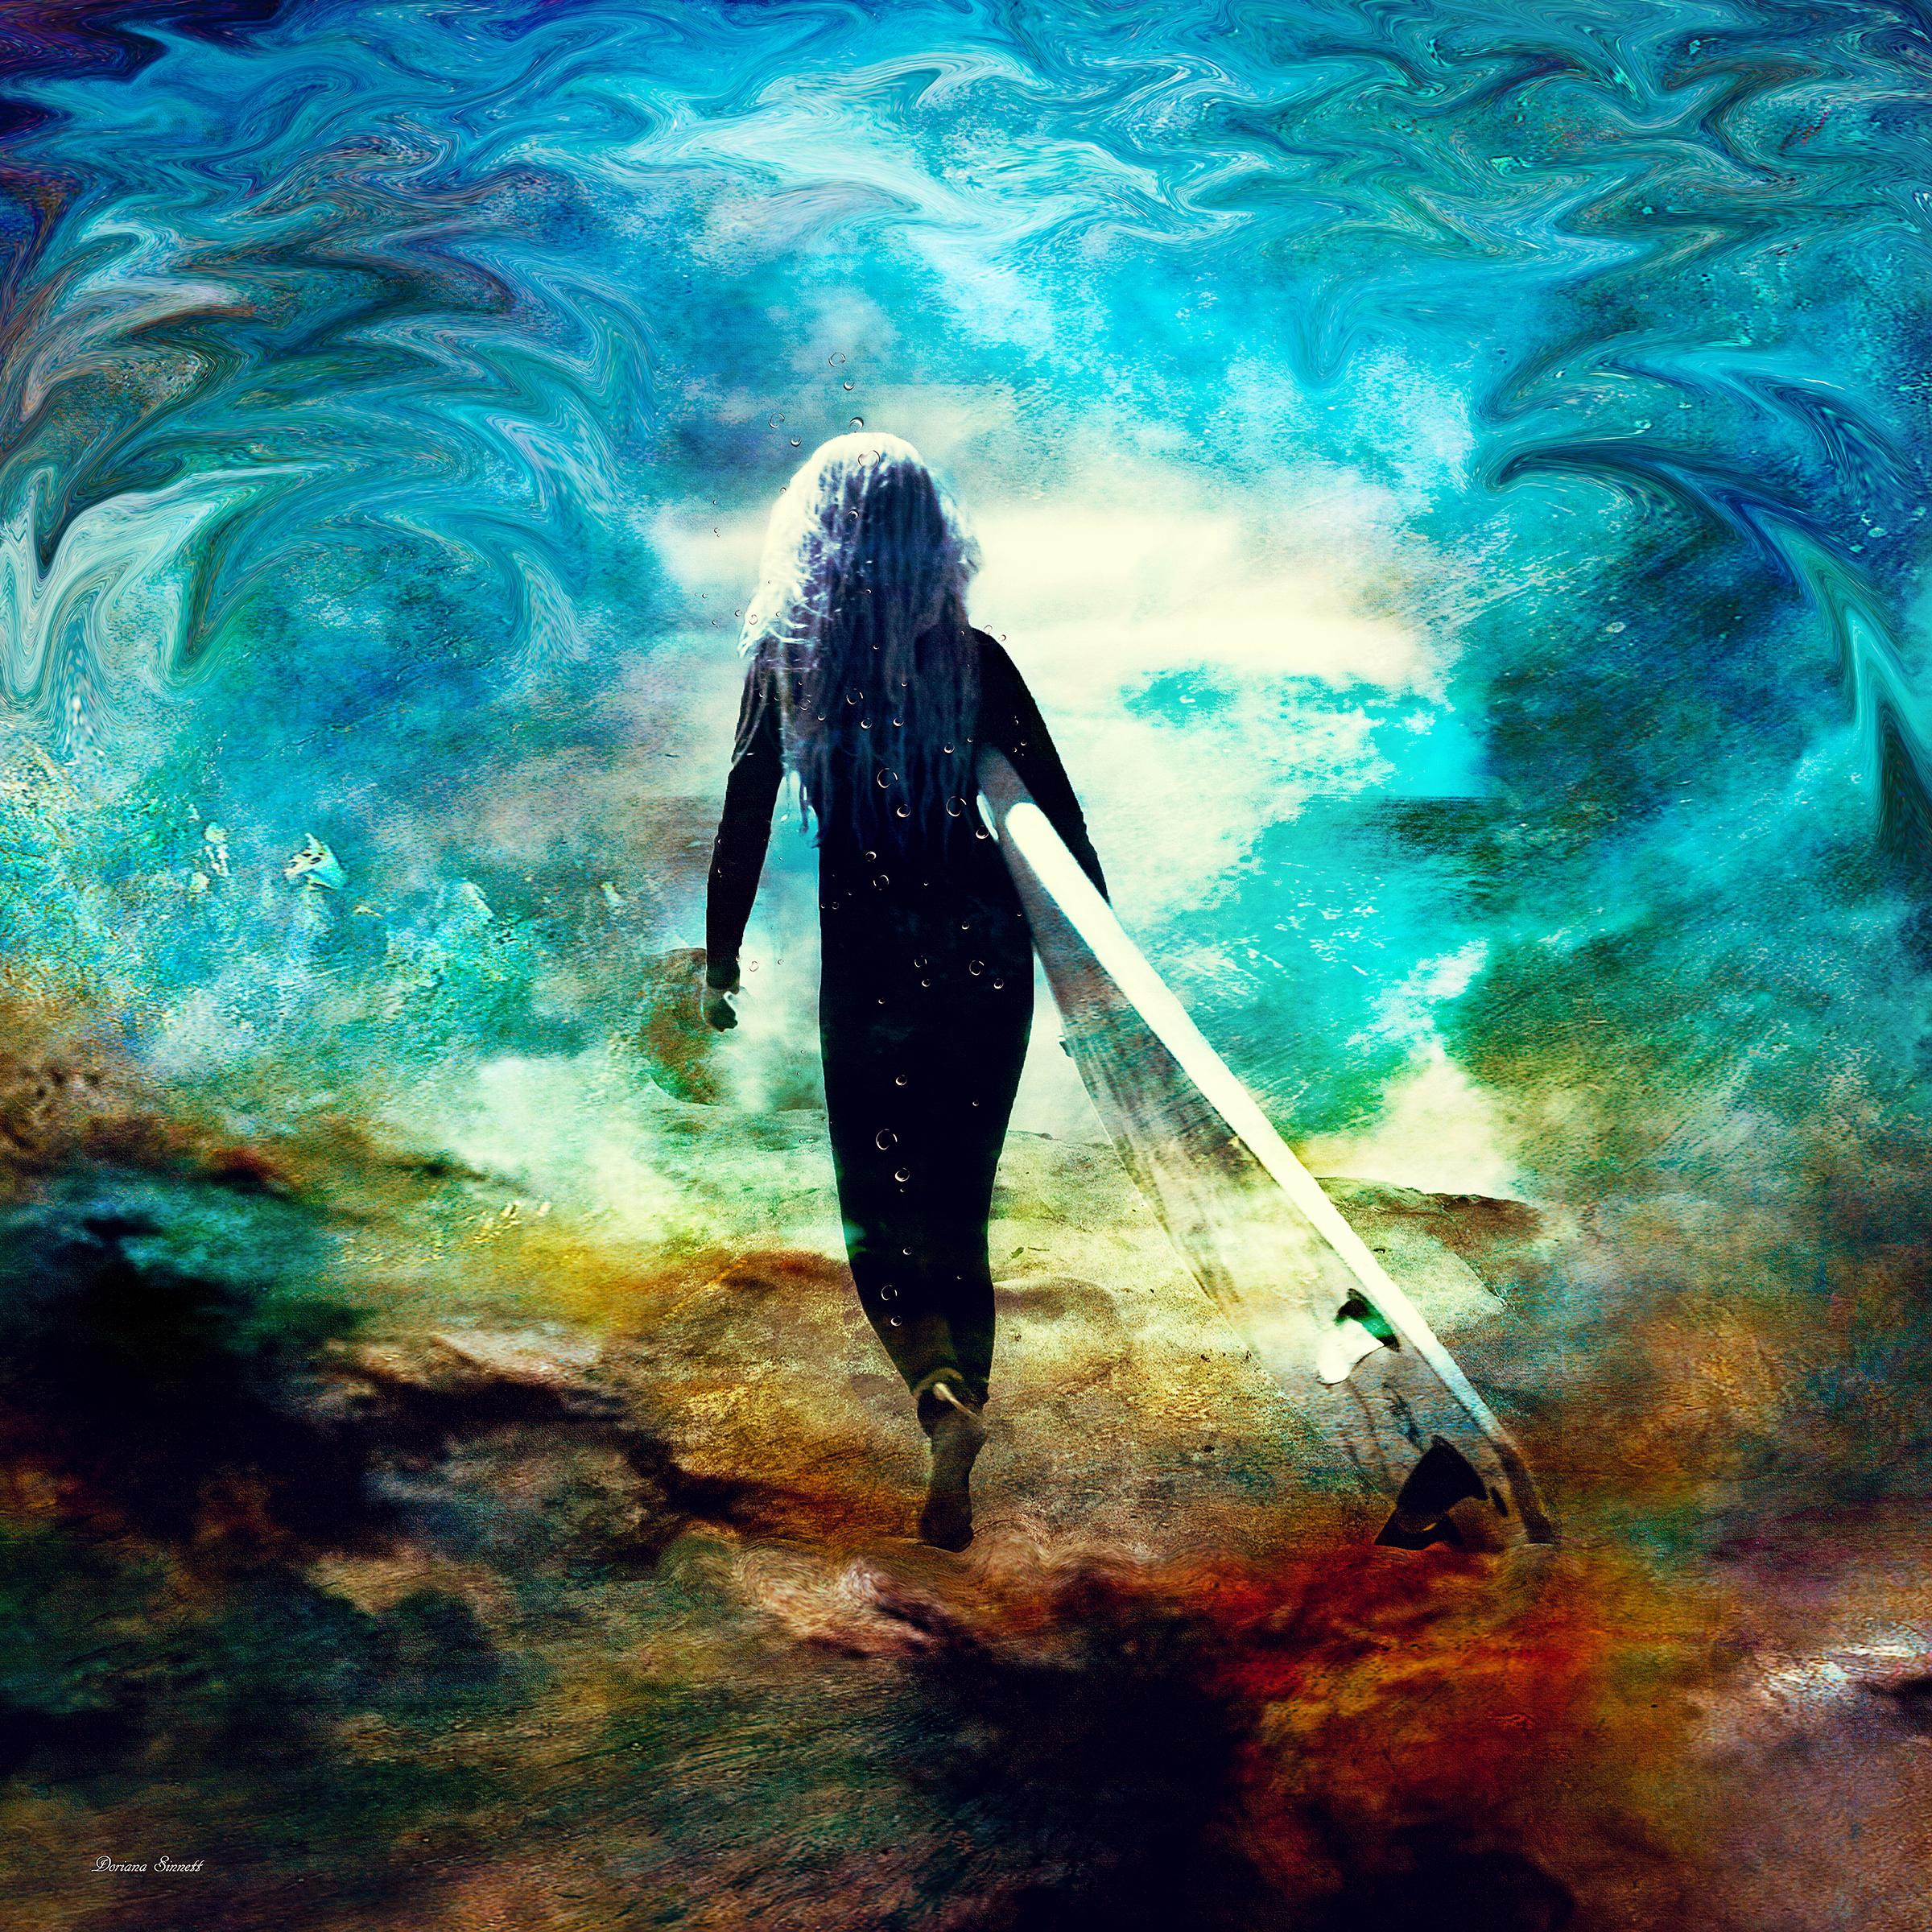 The Surfer..BUY   https://artboja.com/art/38vvy2/22067.php